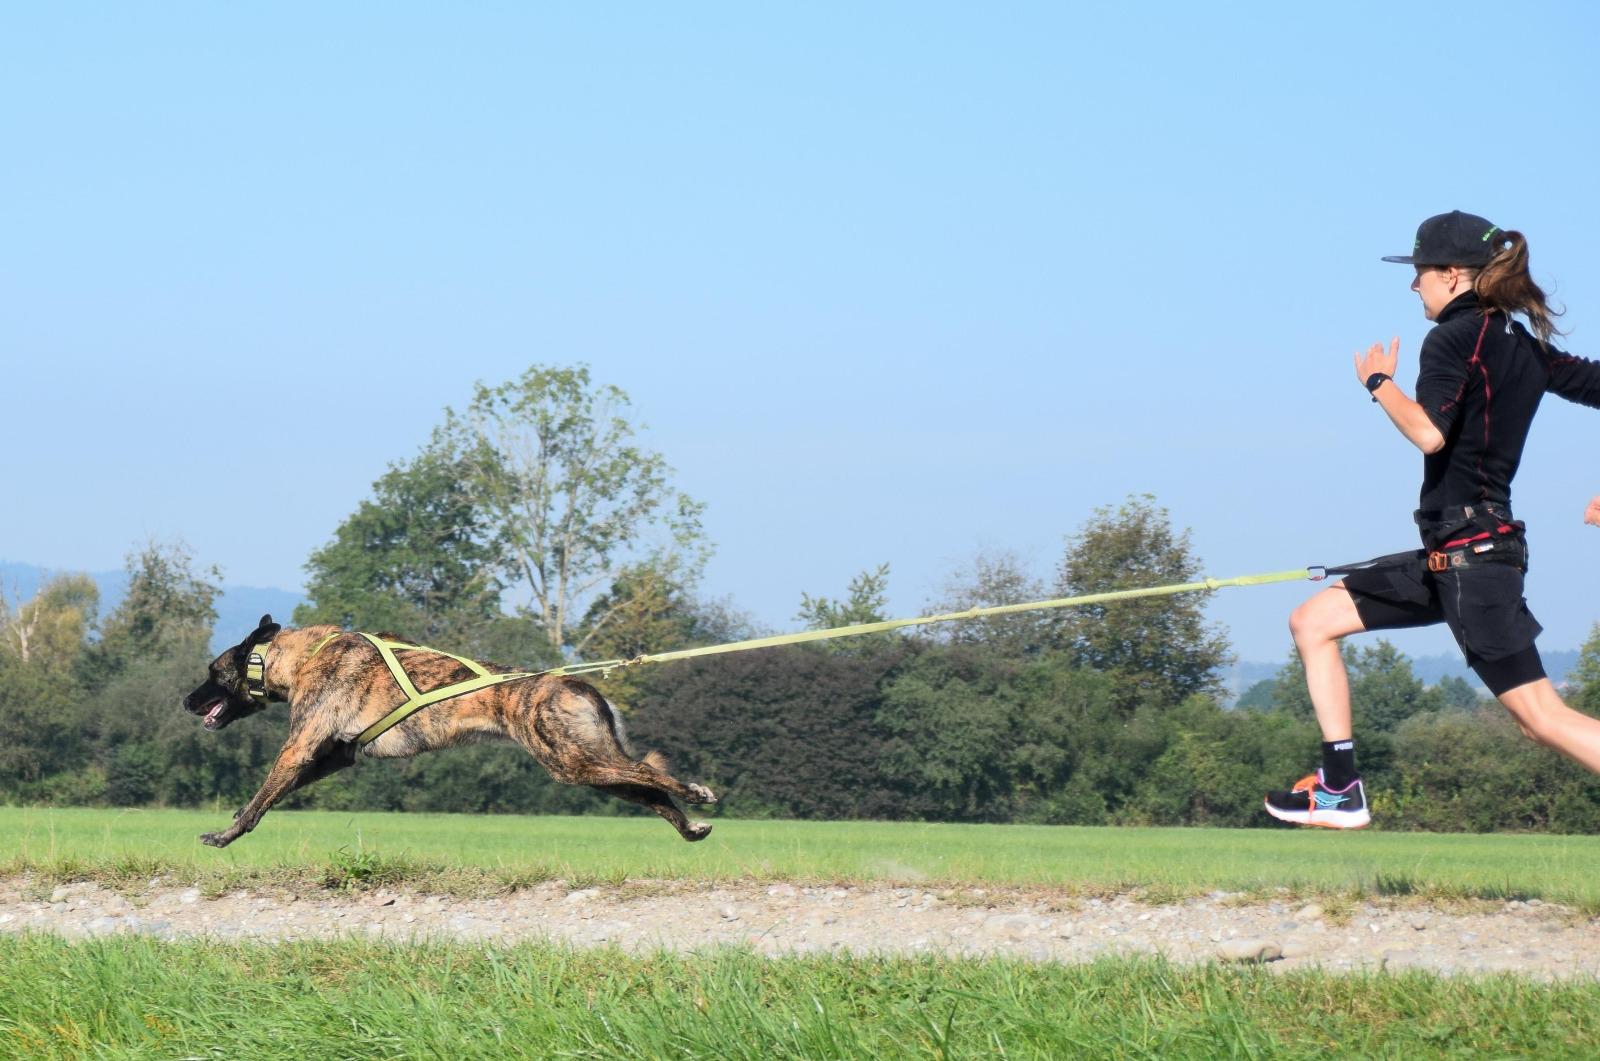 LakeDog Hundeschule Canicross Workshop